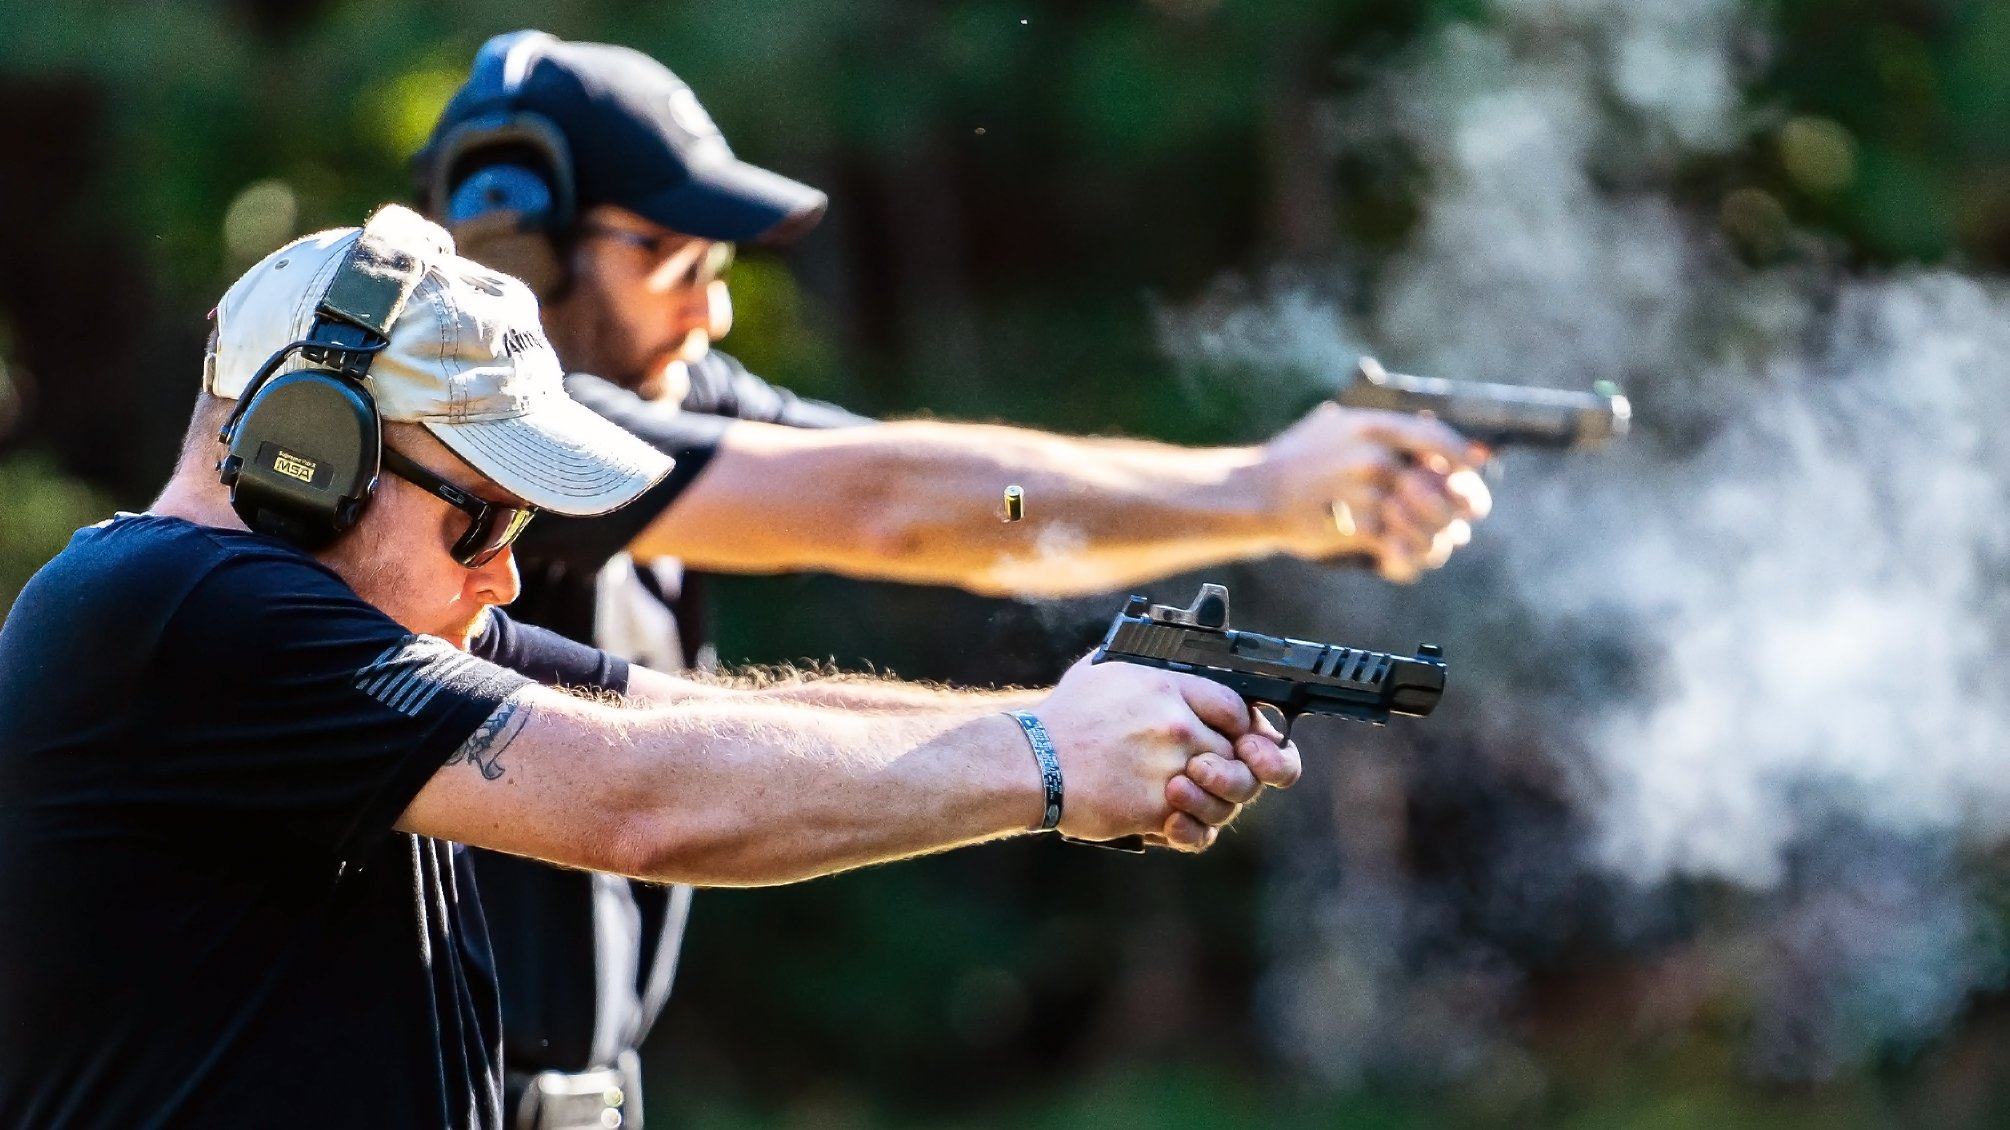 FN 509 LS Edge Versus Dave